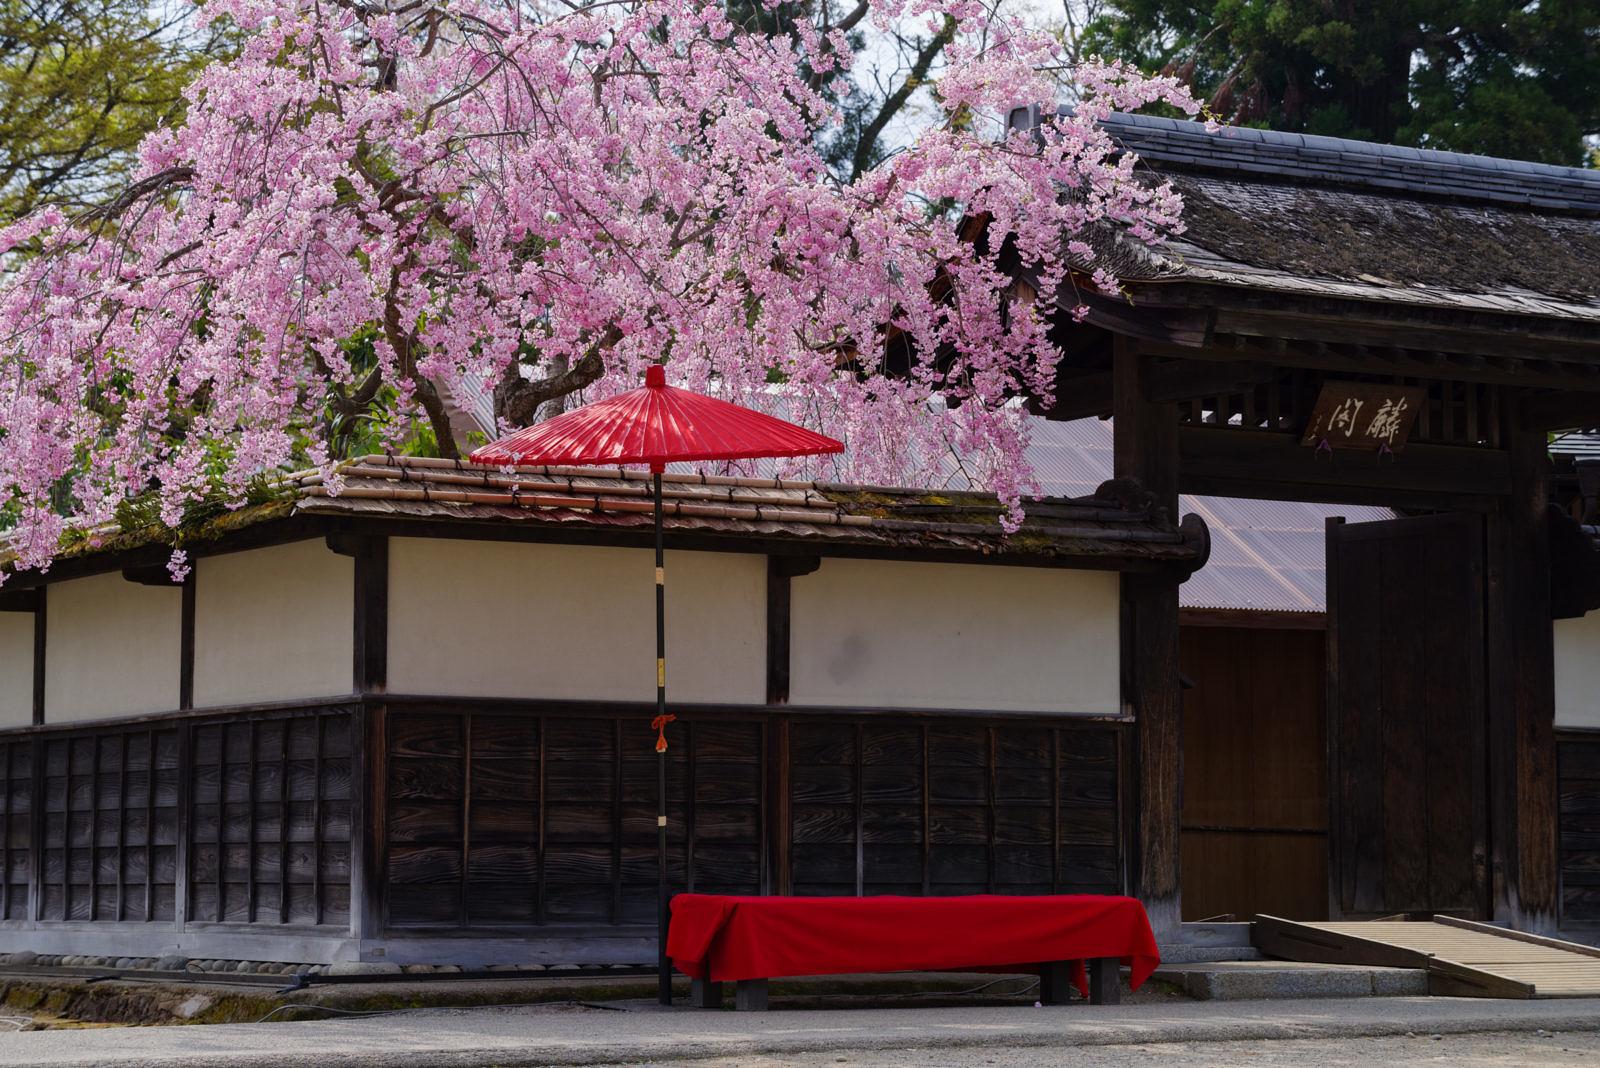 会津若松城の桜 | PENTAX K-1&D FA★70-200mm